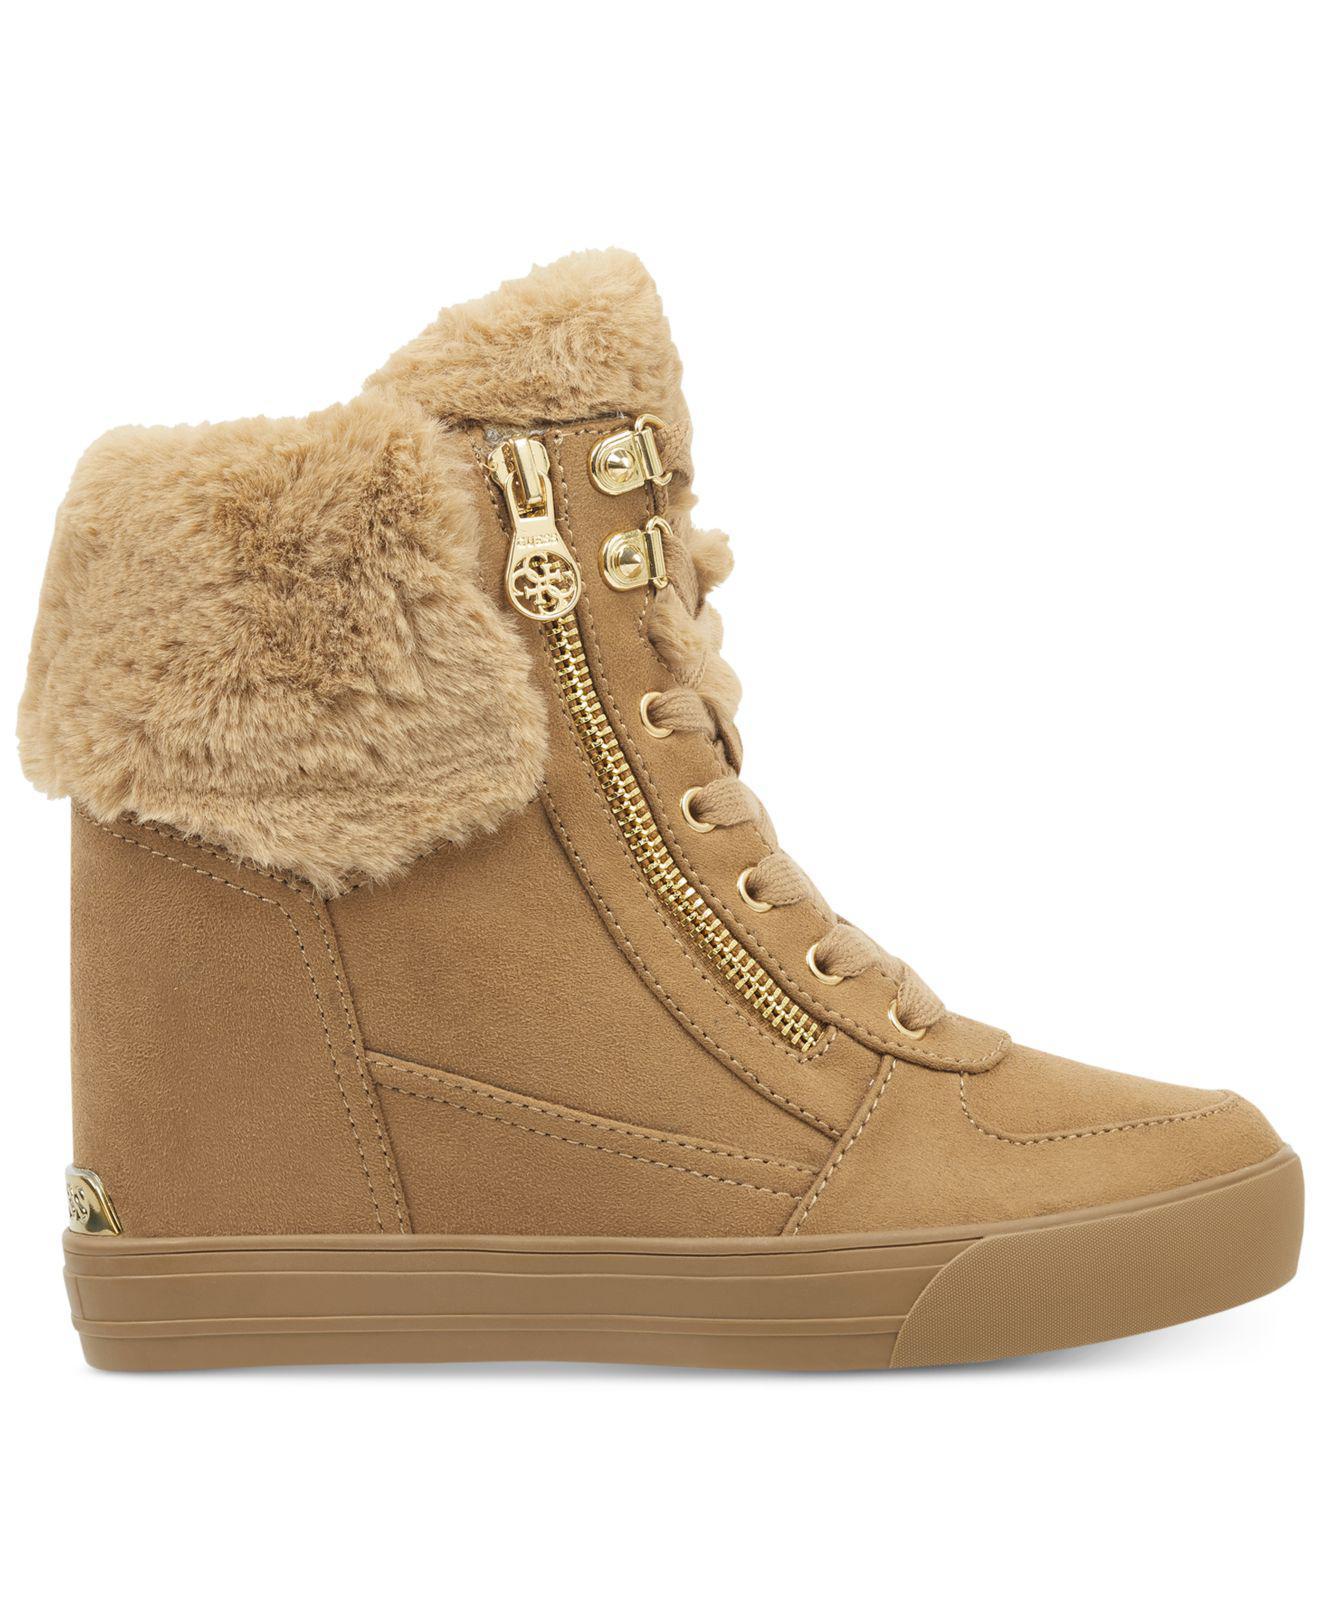 8b1b1657426 Lyst - Guess Dustyn Wedge Sneakers in Natural